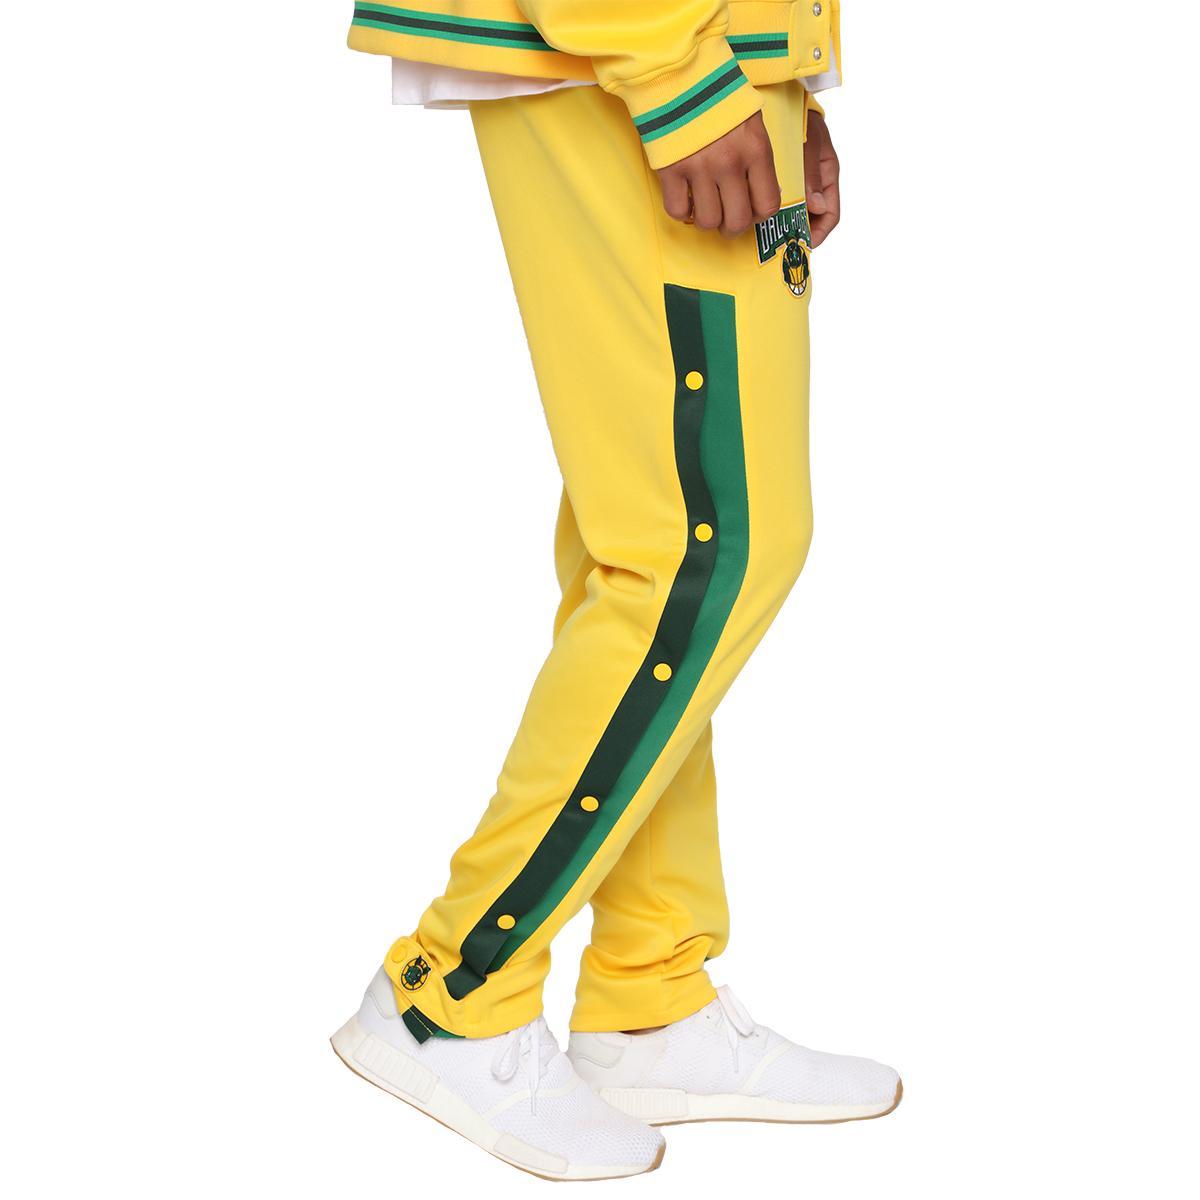 Team Ball Hogs Joggers - Yellow/Combo